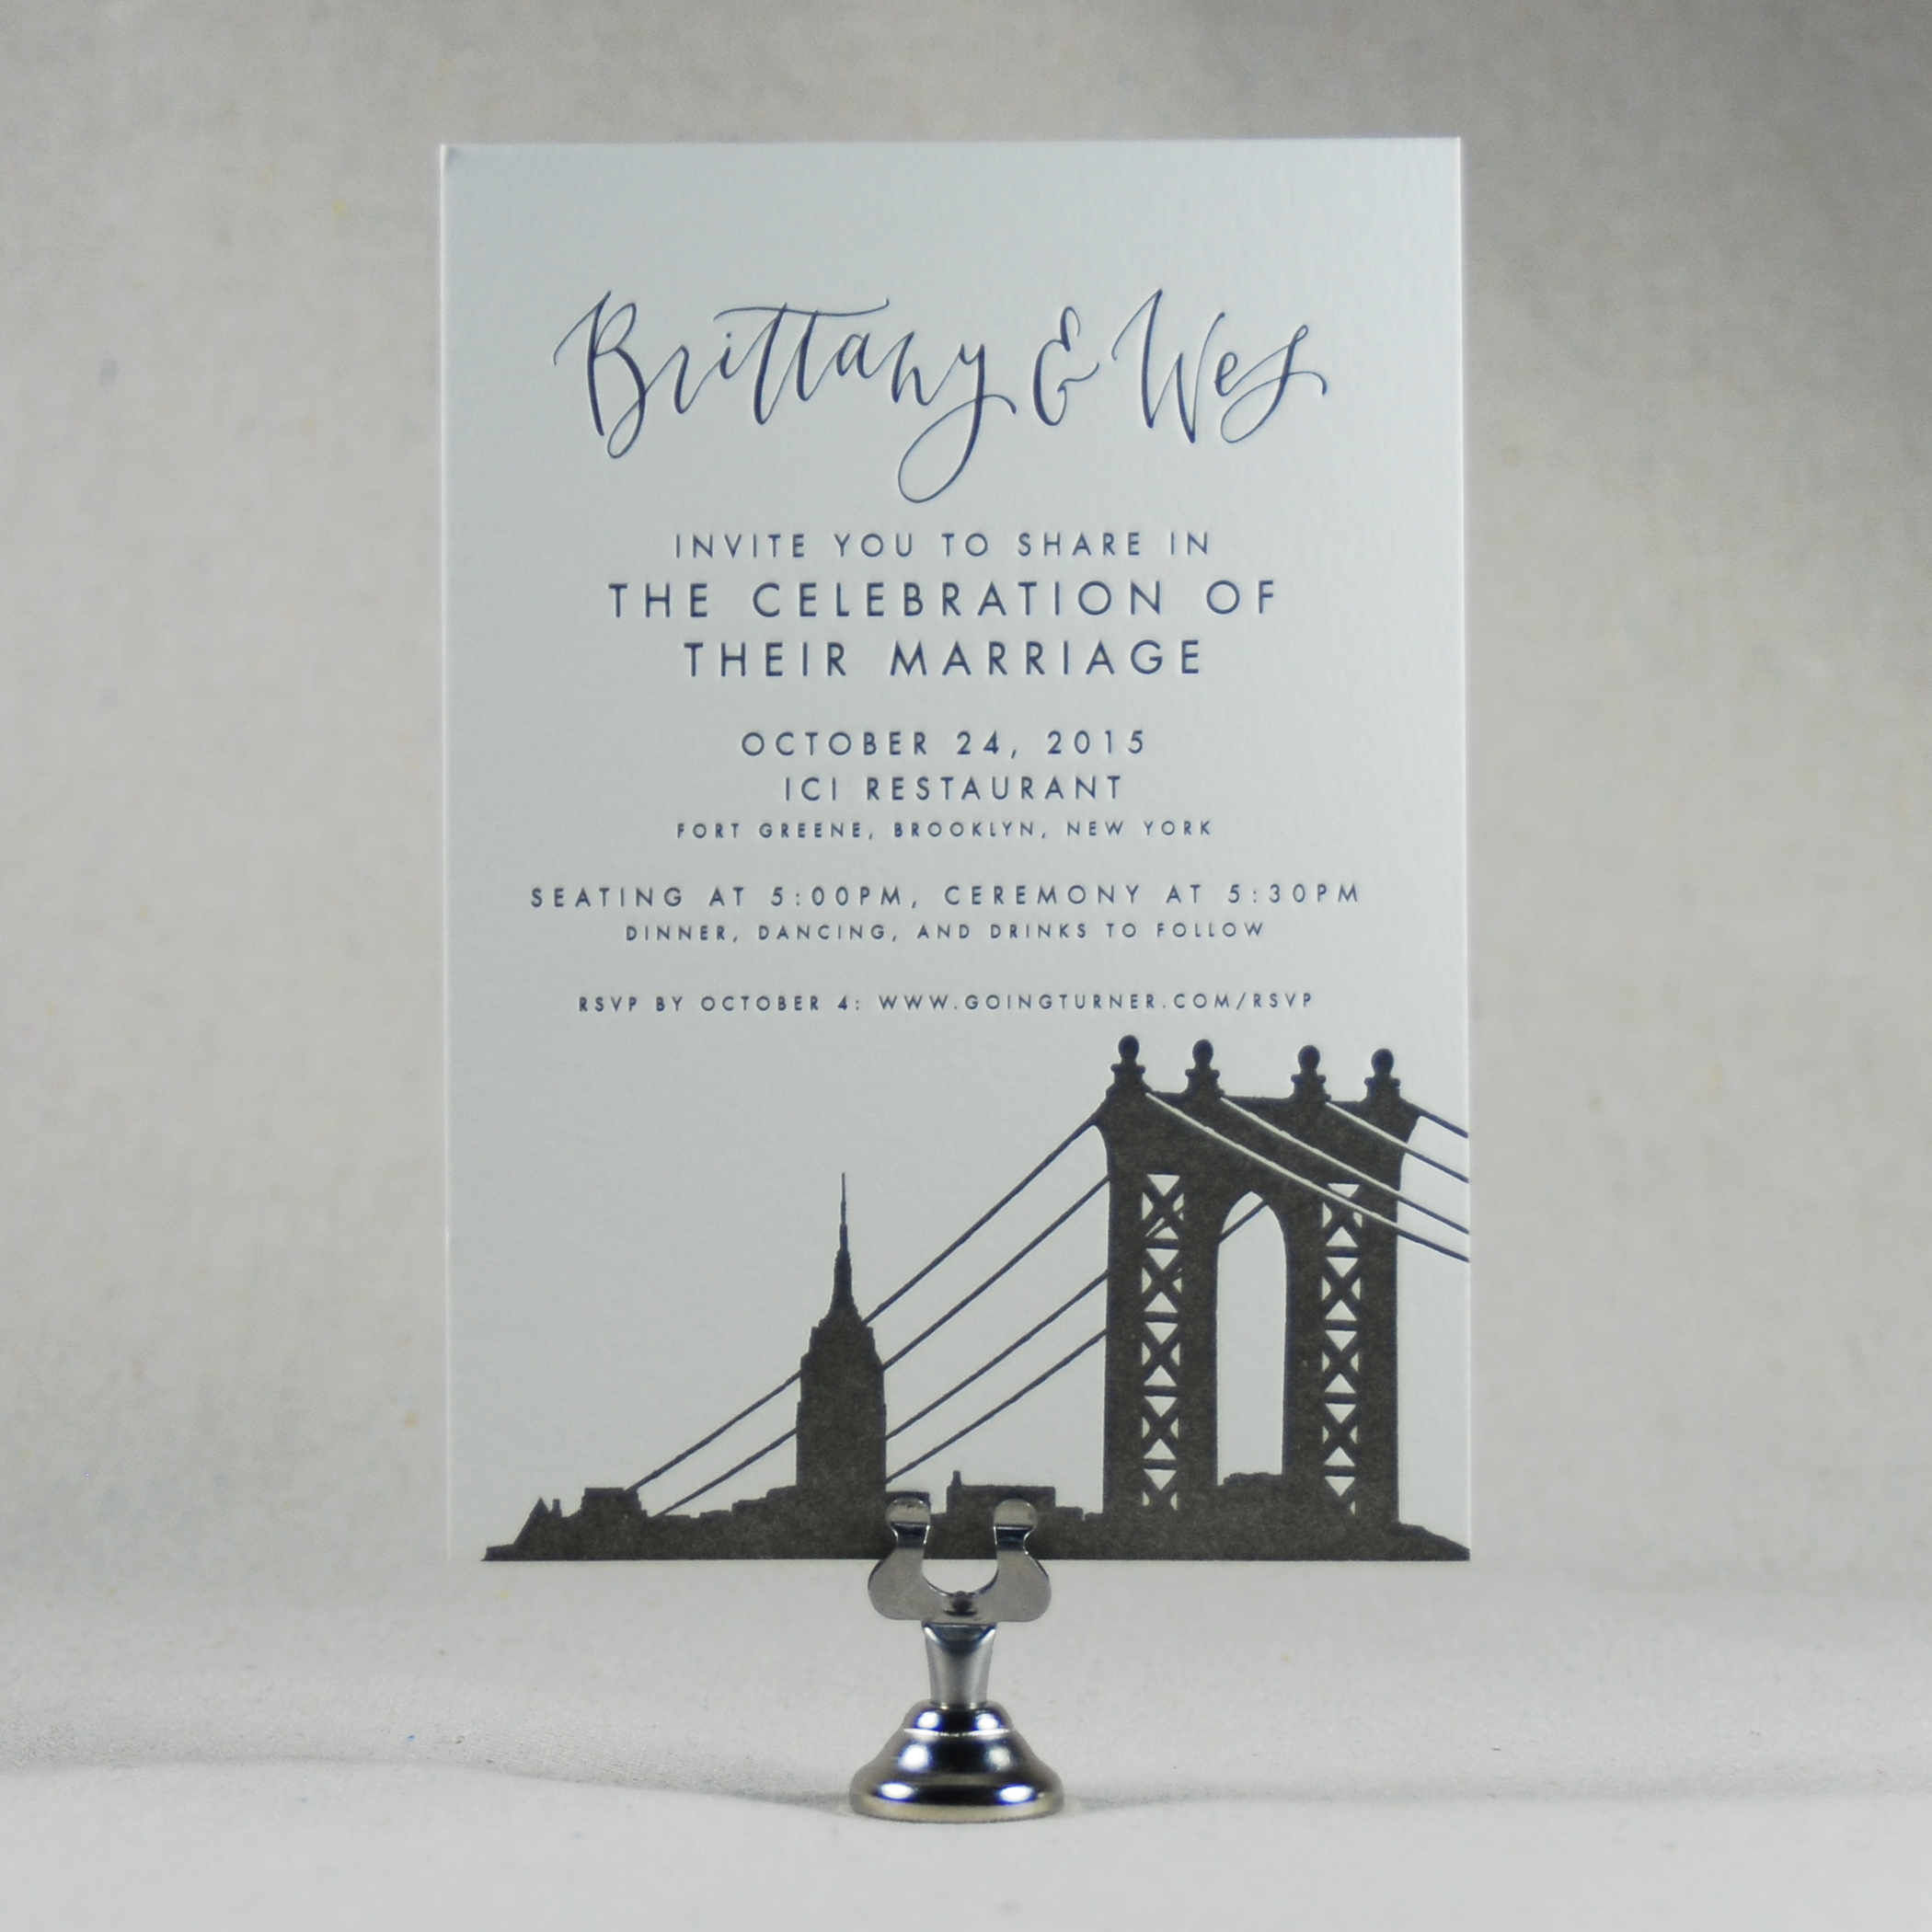 Wedding_Brittany_Invite.JPG